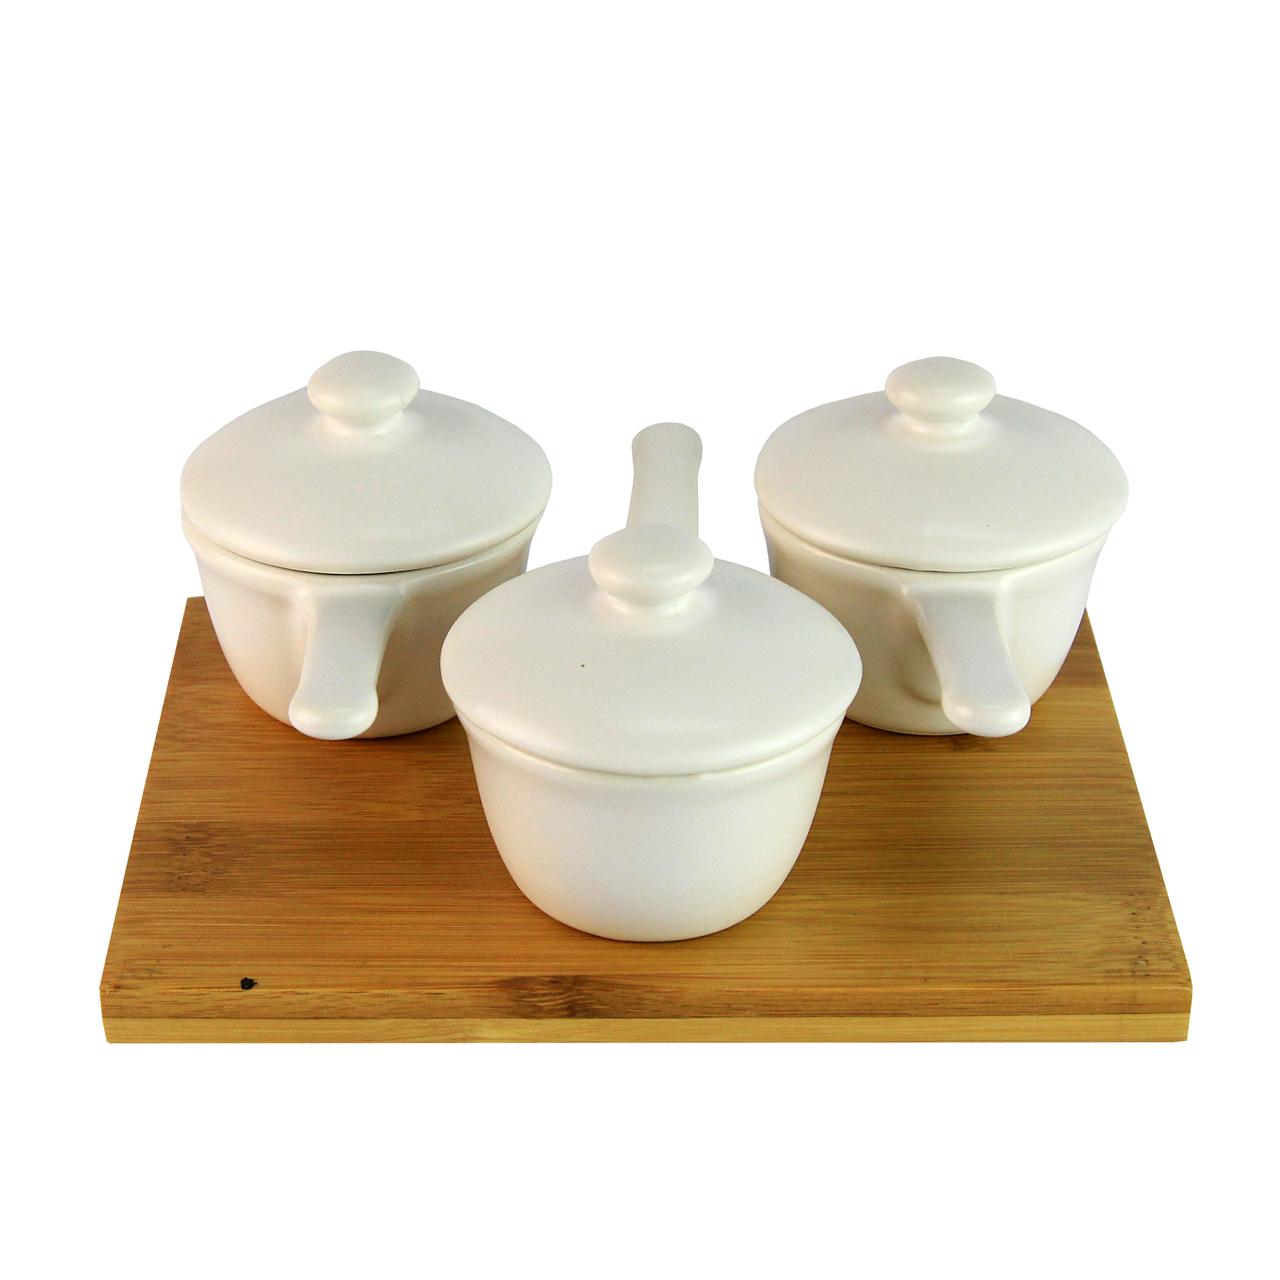 Tava Din Bambus Cu 3 Terine Cu Maner Din Ceramica